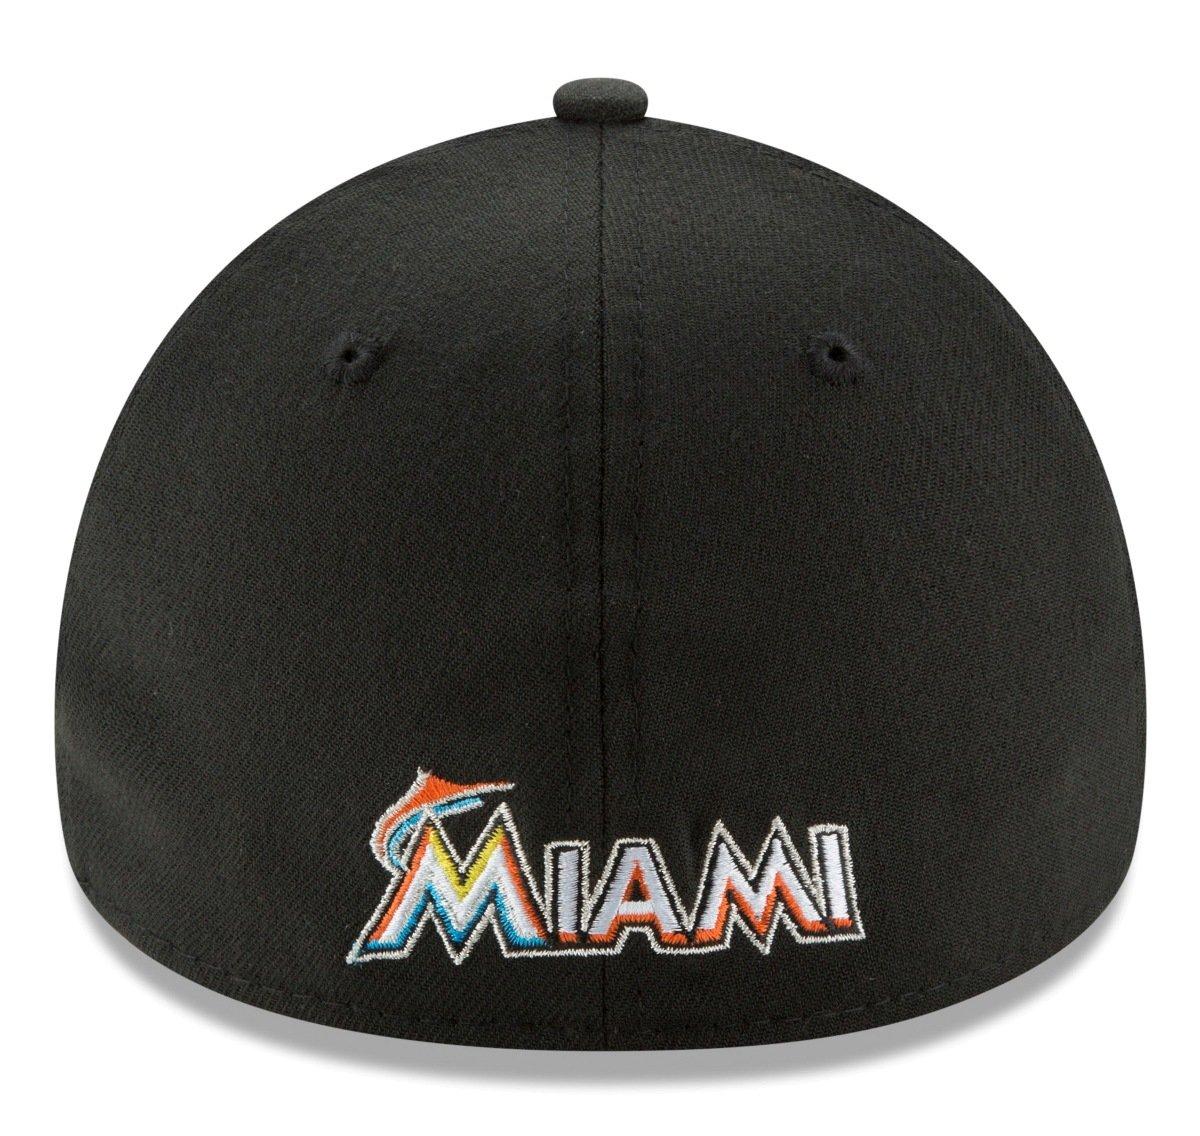 info for d1ed1 a76e6 Amazon.com   New Era Miami Marlins MLB 39THIRTY Team Classic Flex Fit Hat    Sports   Outdoors